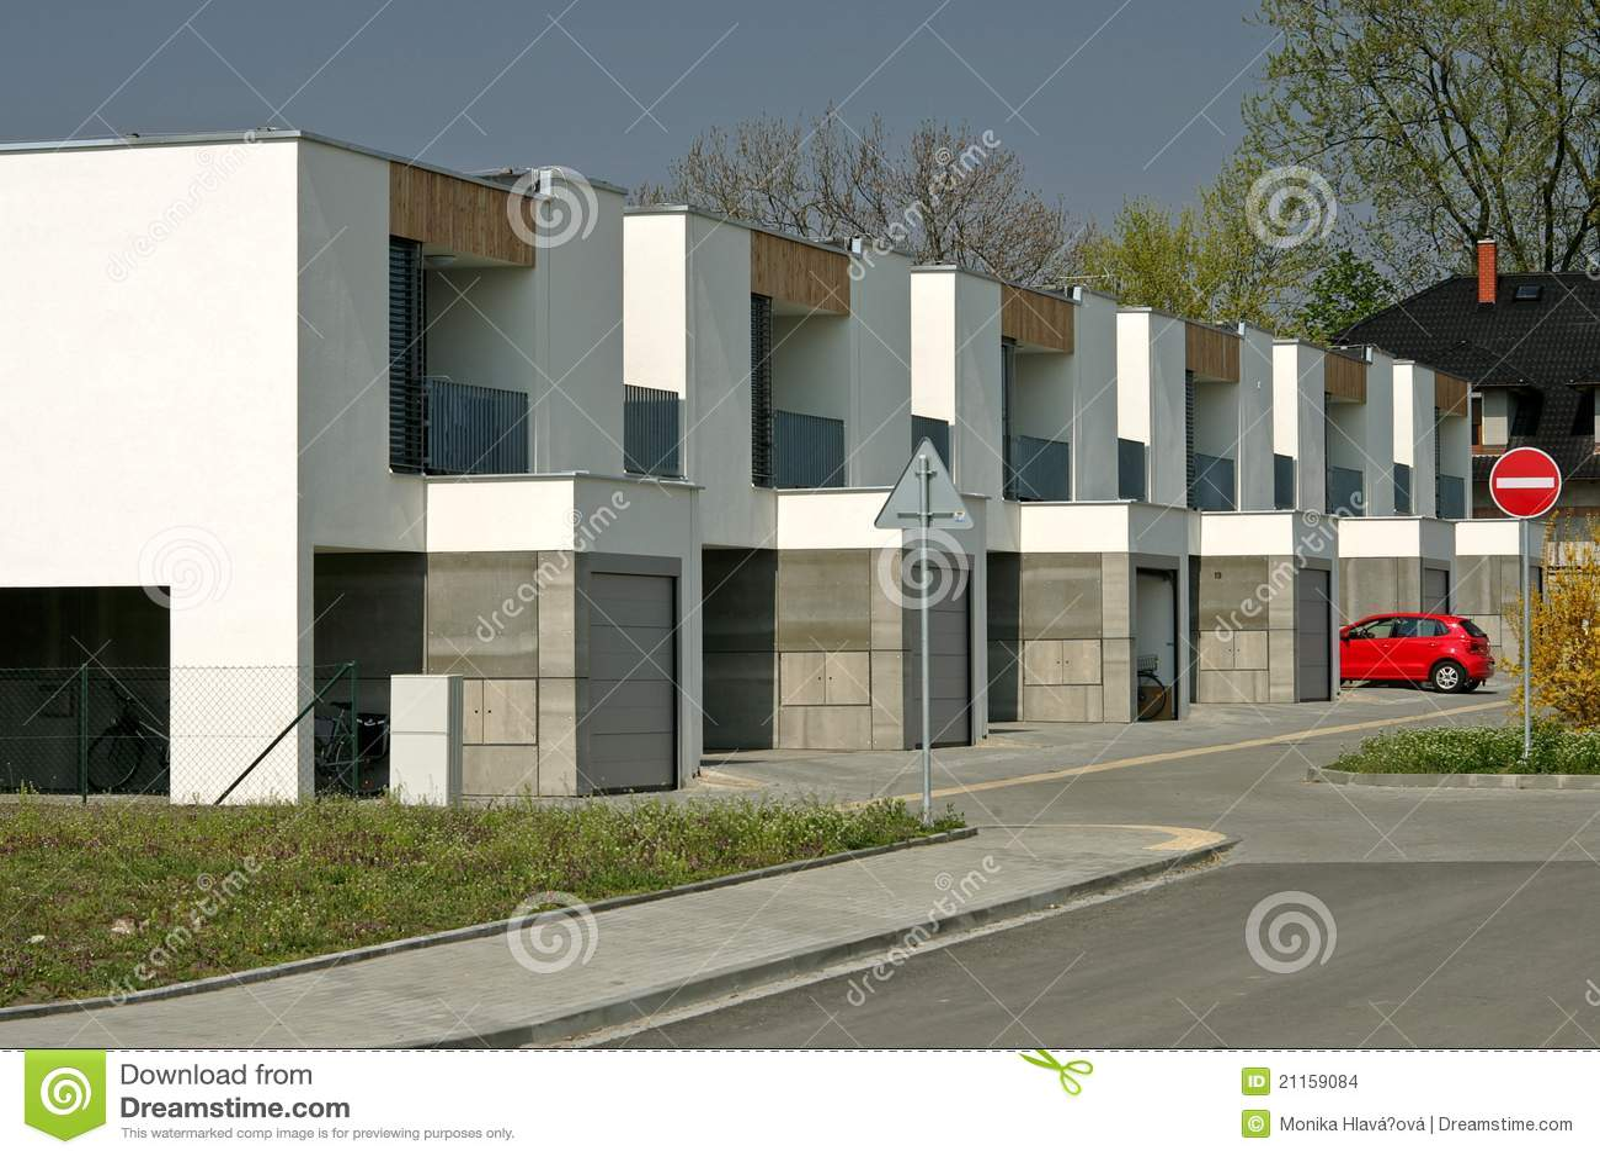 Neue Moderne Häuser Stockbilder - Bild: 21159084 size: 1300 x 957 post ID: 5 File size: 0 B